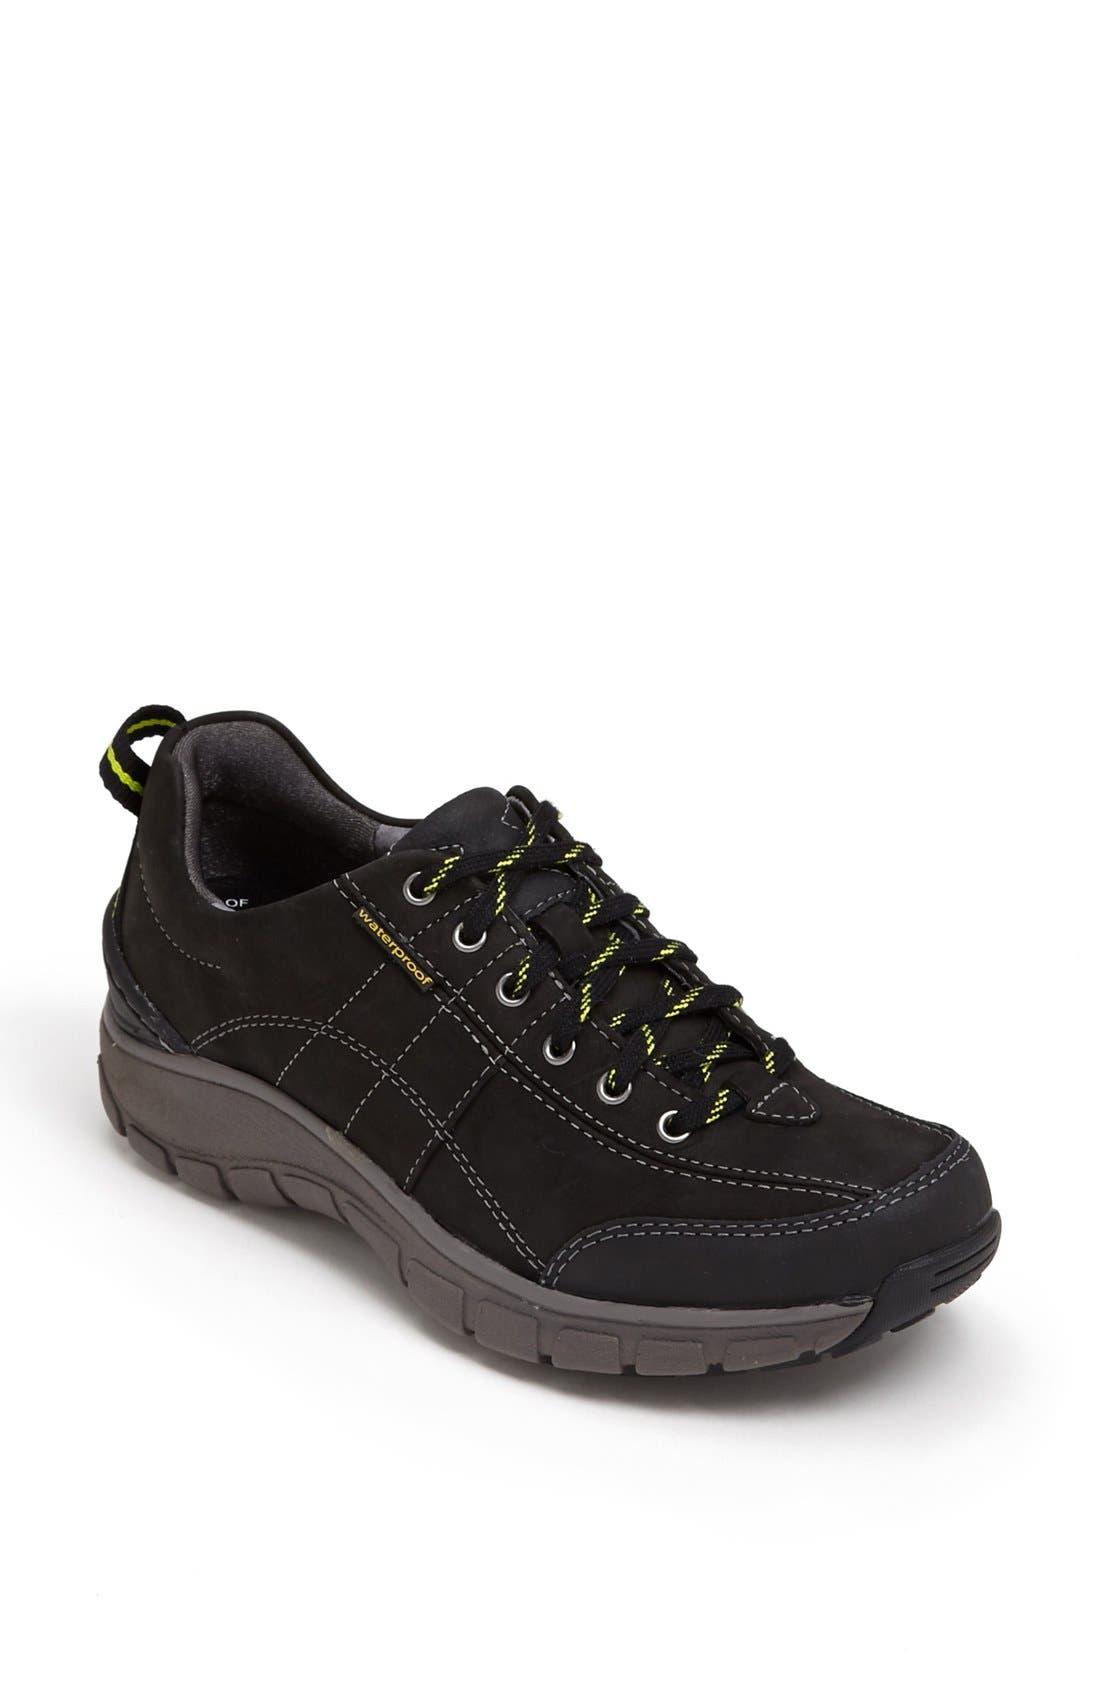 Clarks® 'Wave Trek' Waterproof Sneaker